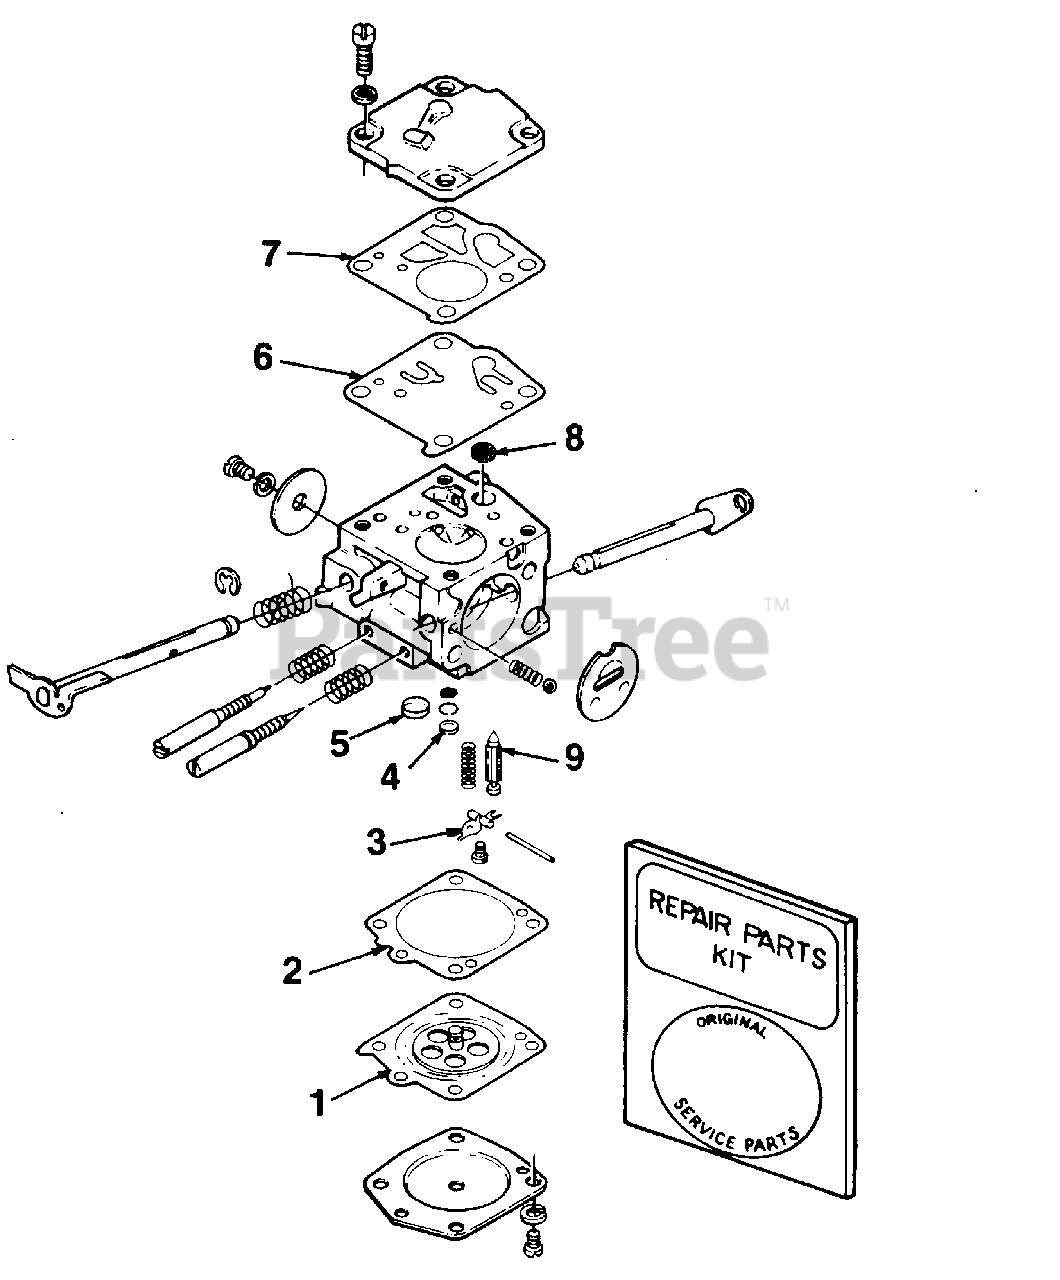 32 Homelite Xl Chainsaw Parts Diagram